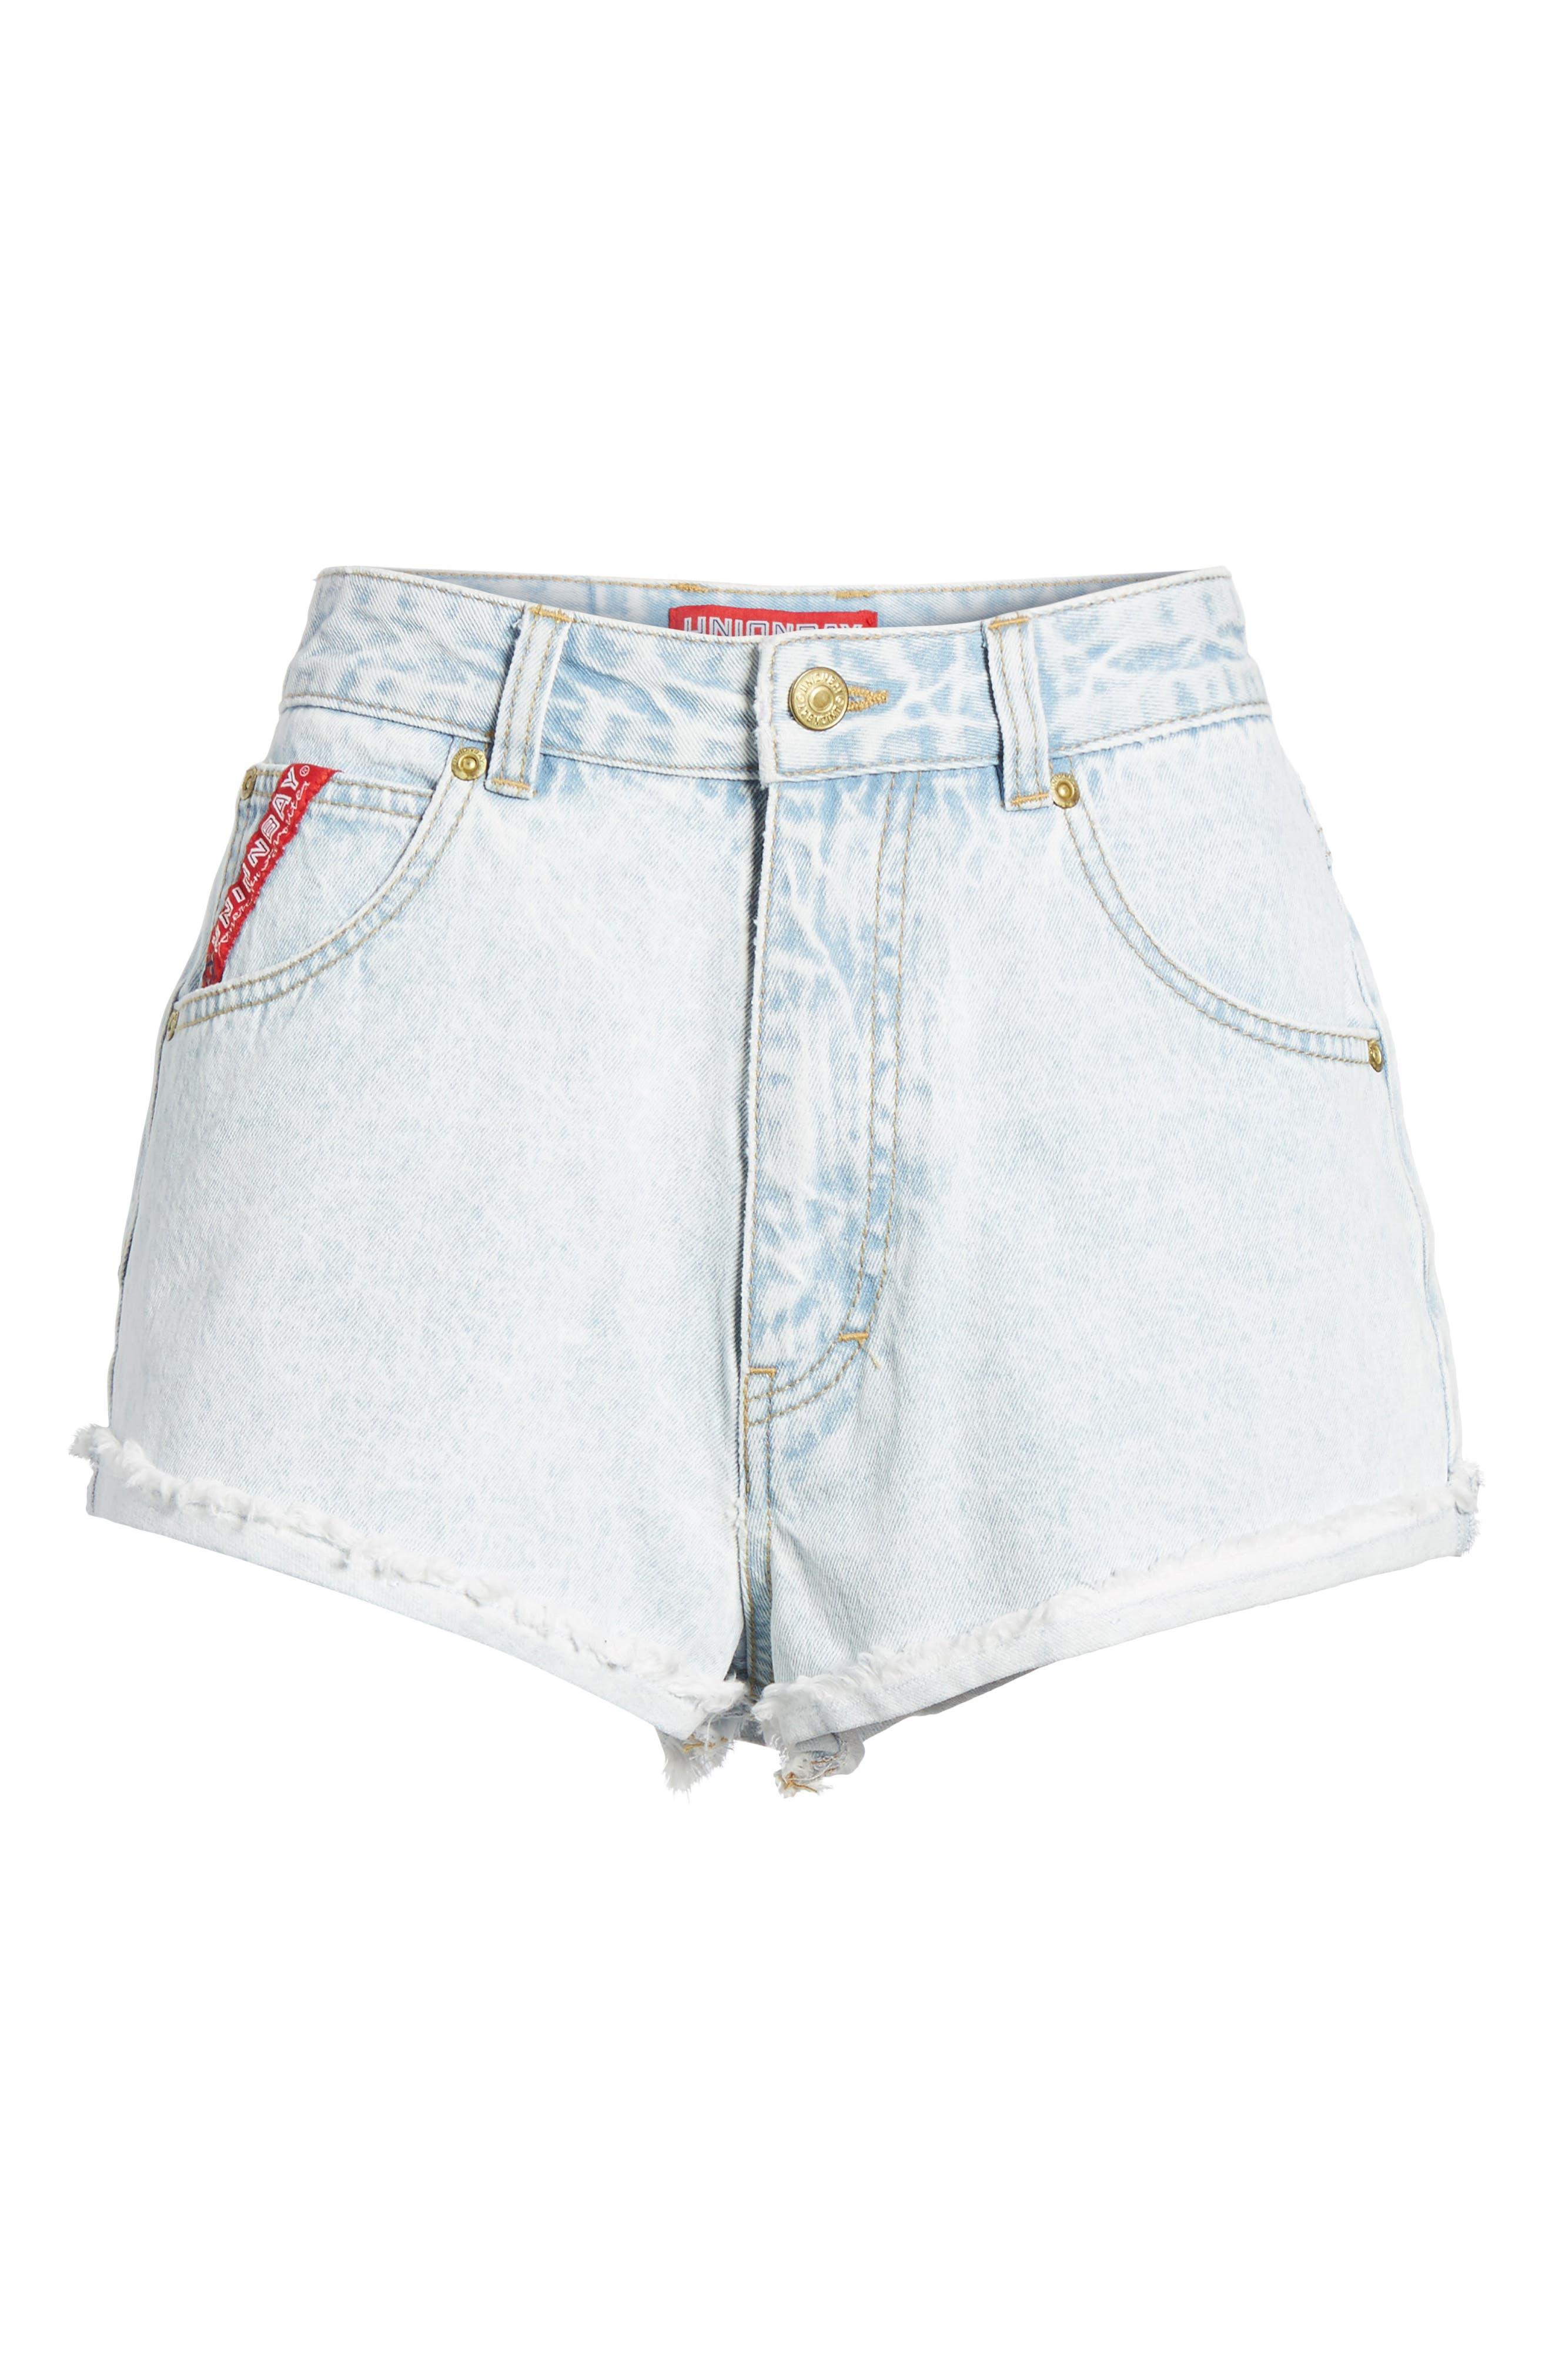 Unionbay Devo Acid Wash Denim Shorts,                             Alternate thumbnail 6, color,                             Icy Wash